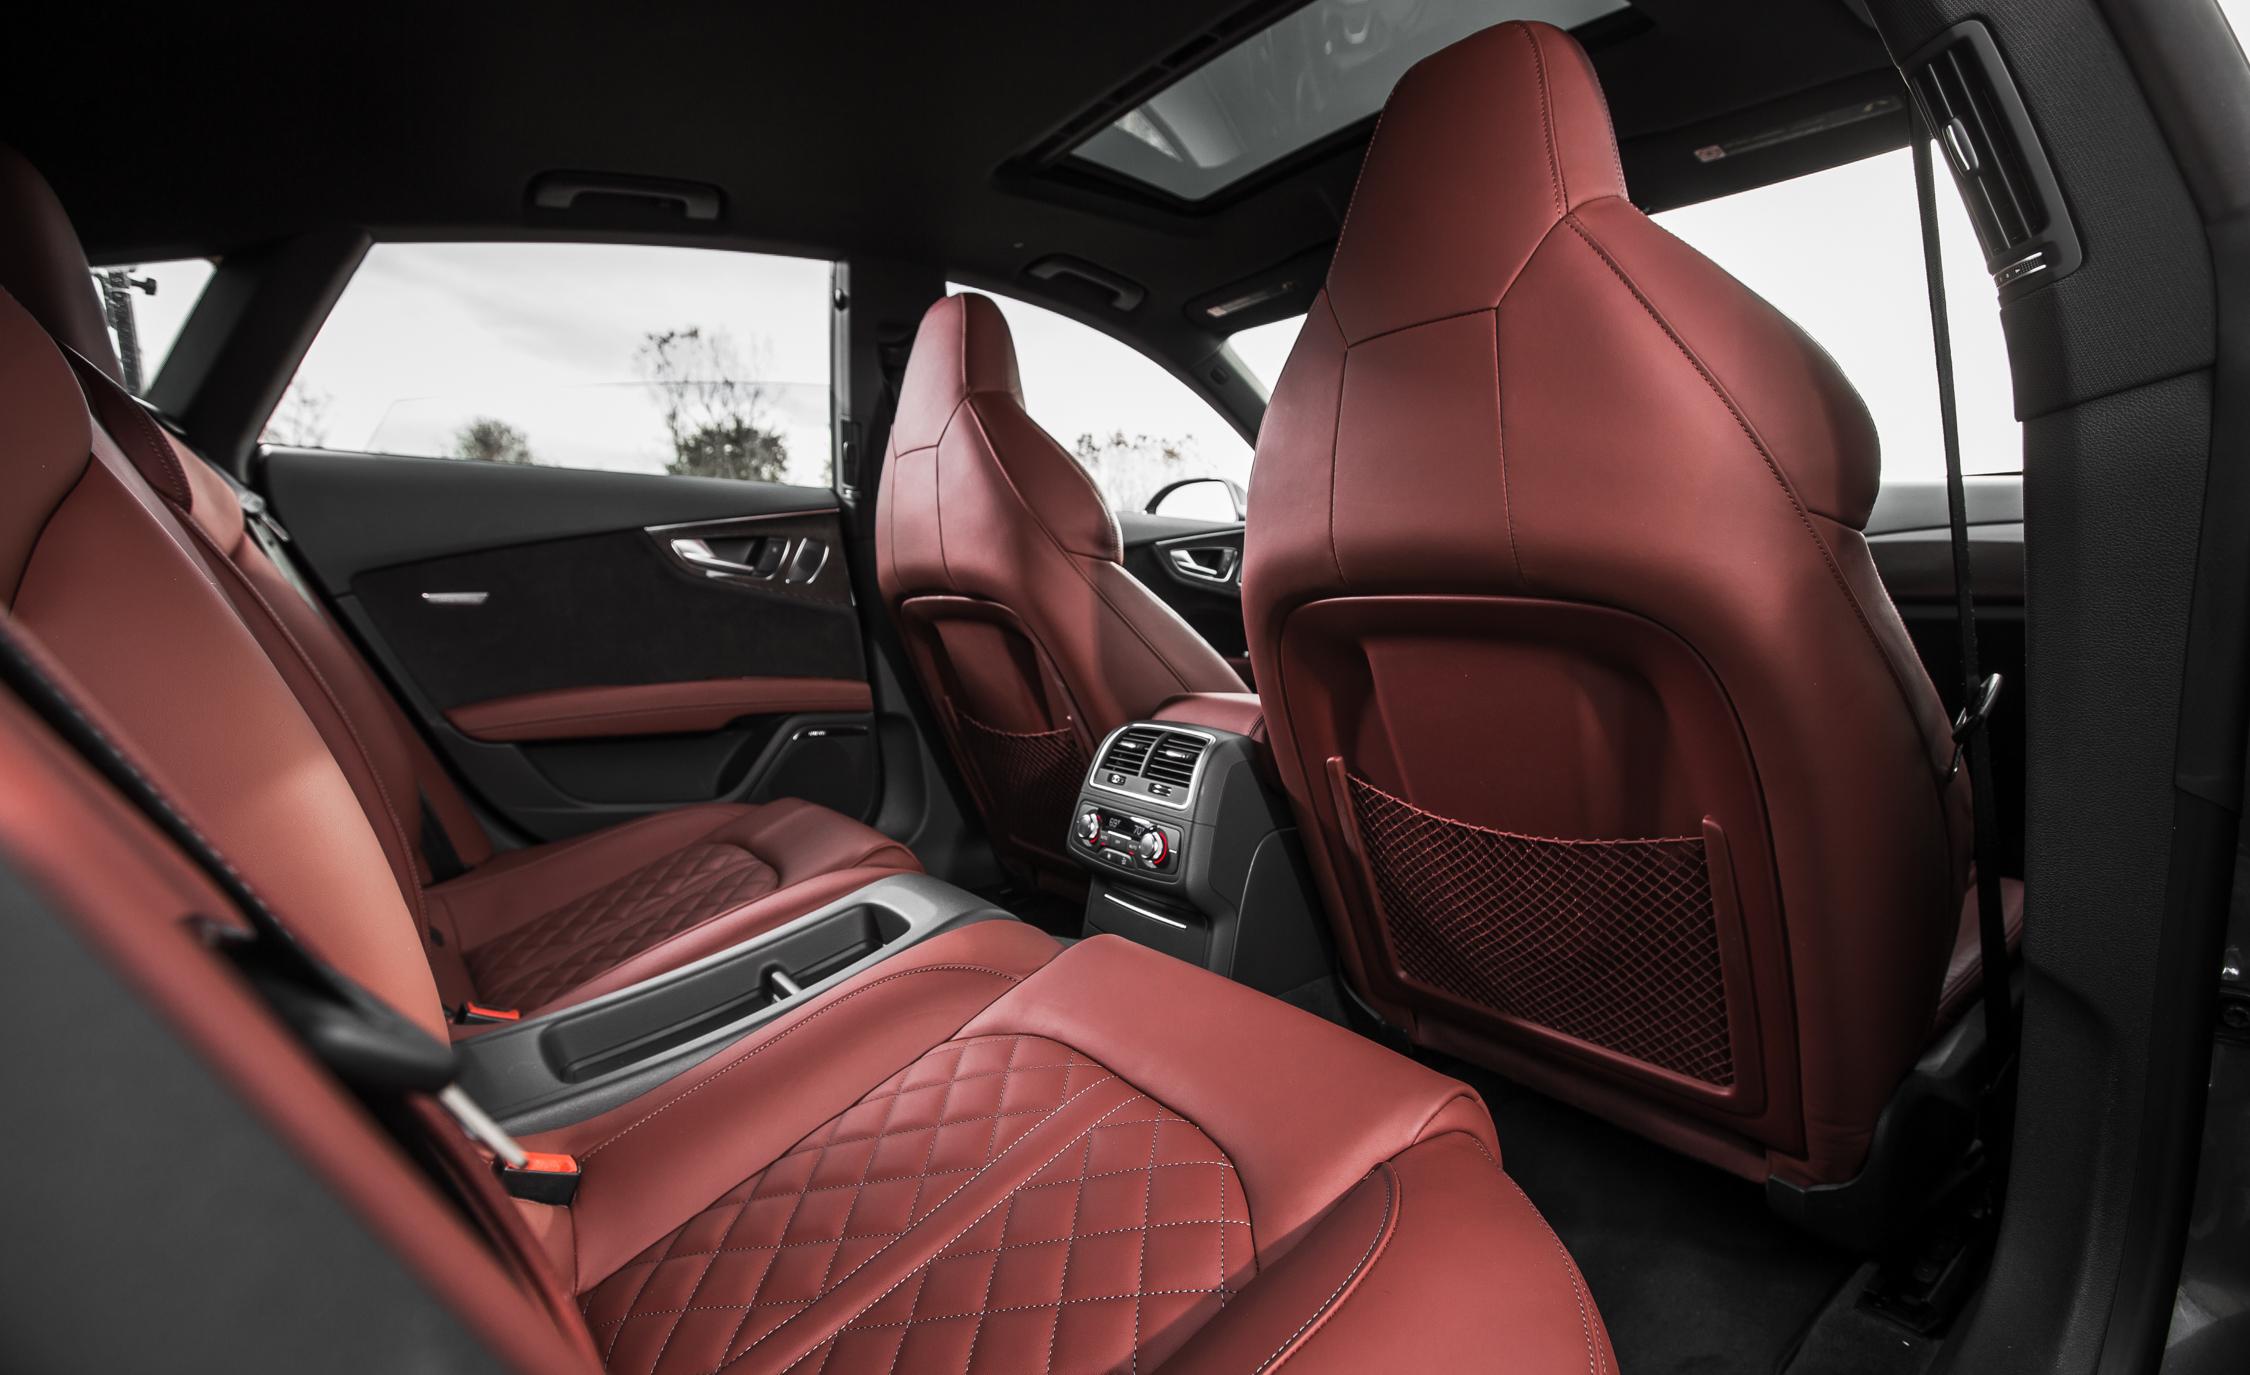 2016 Audi S7 Sedan Rear Interior